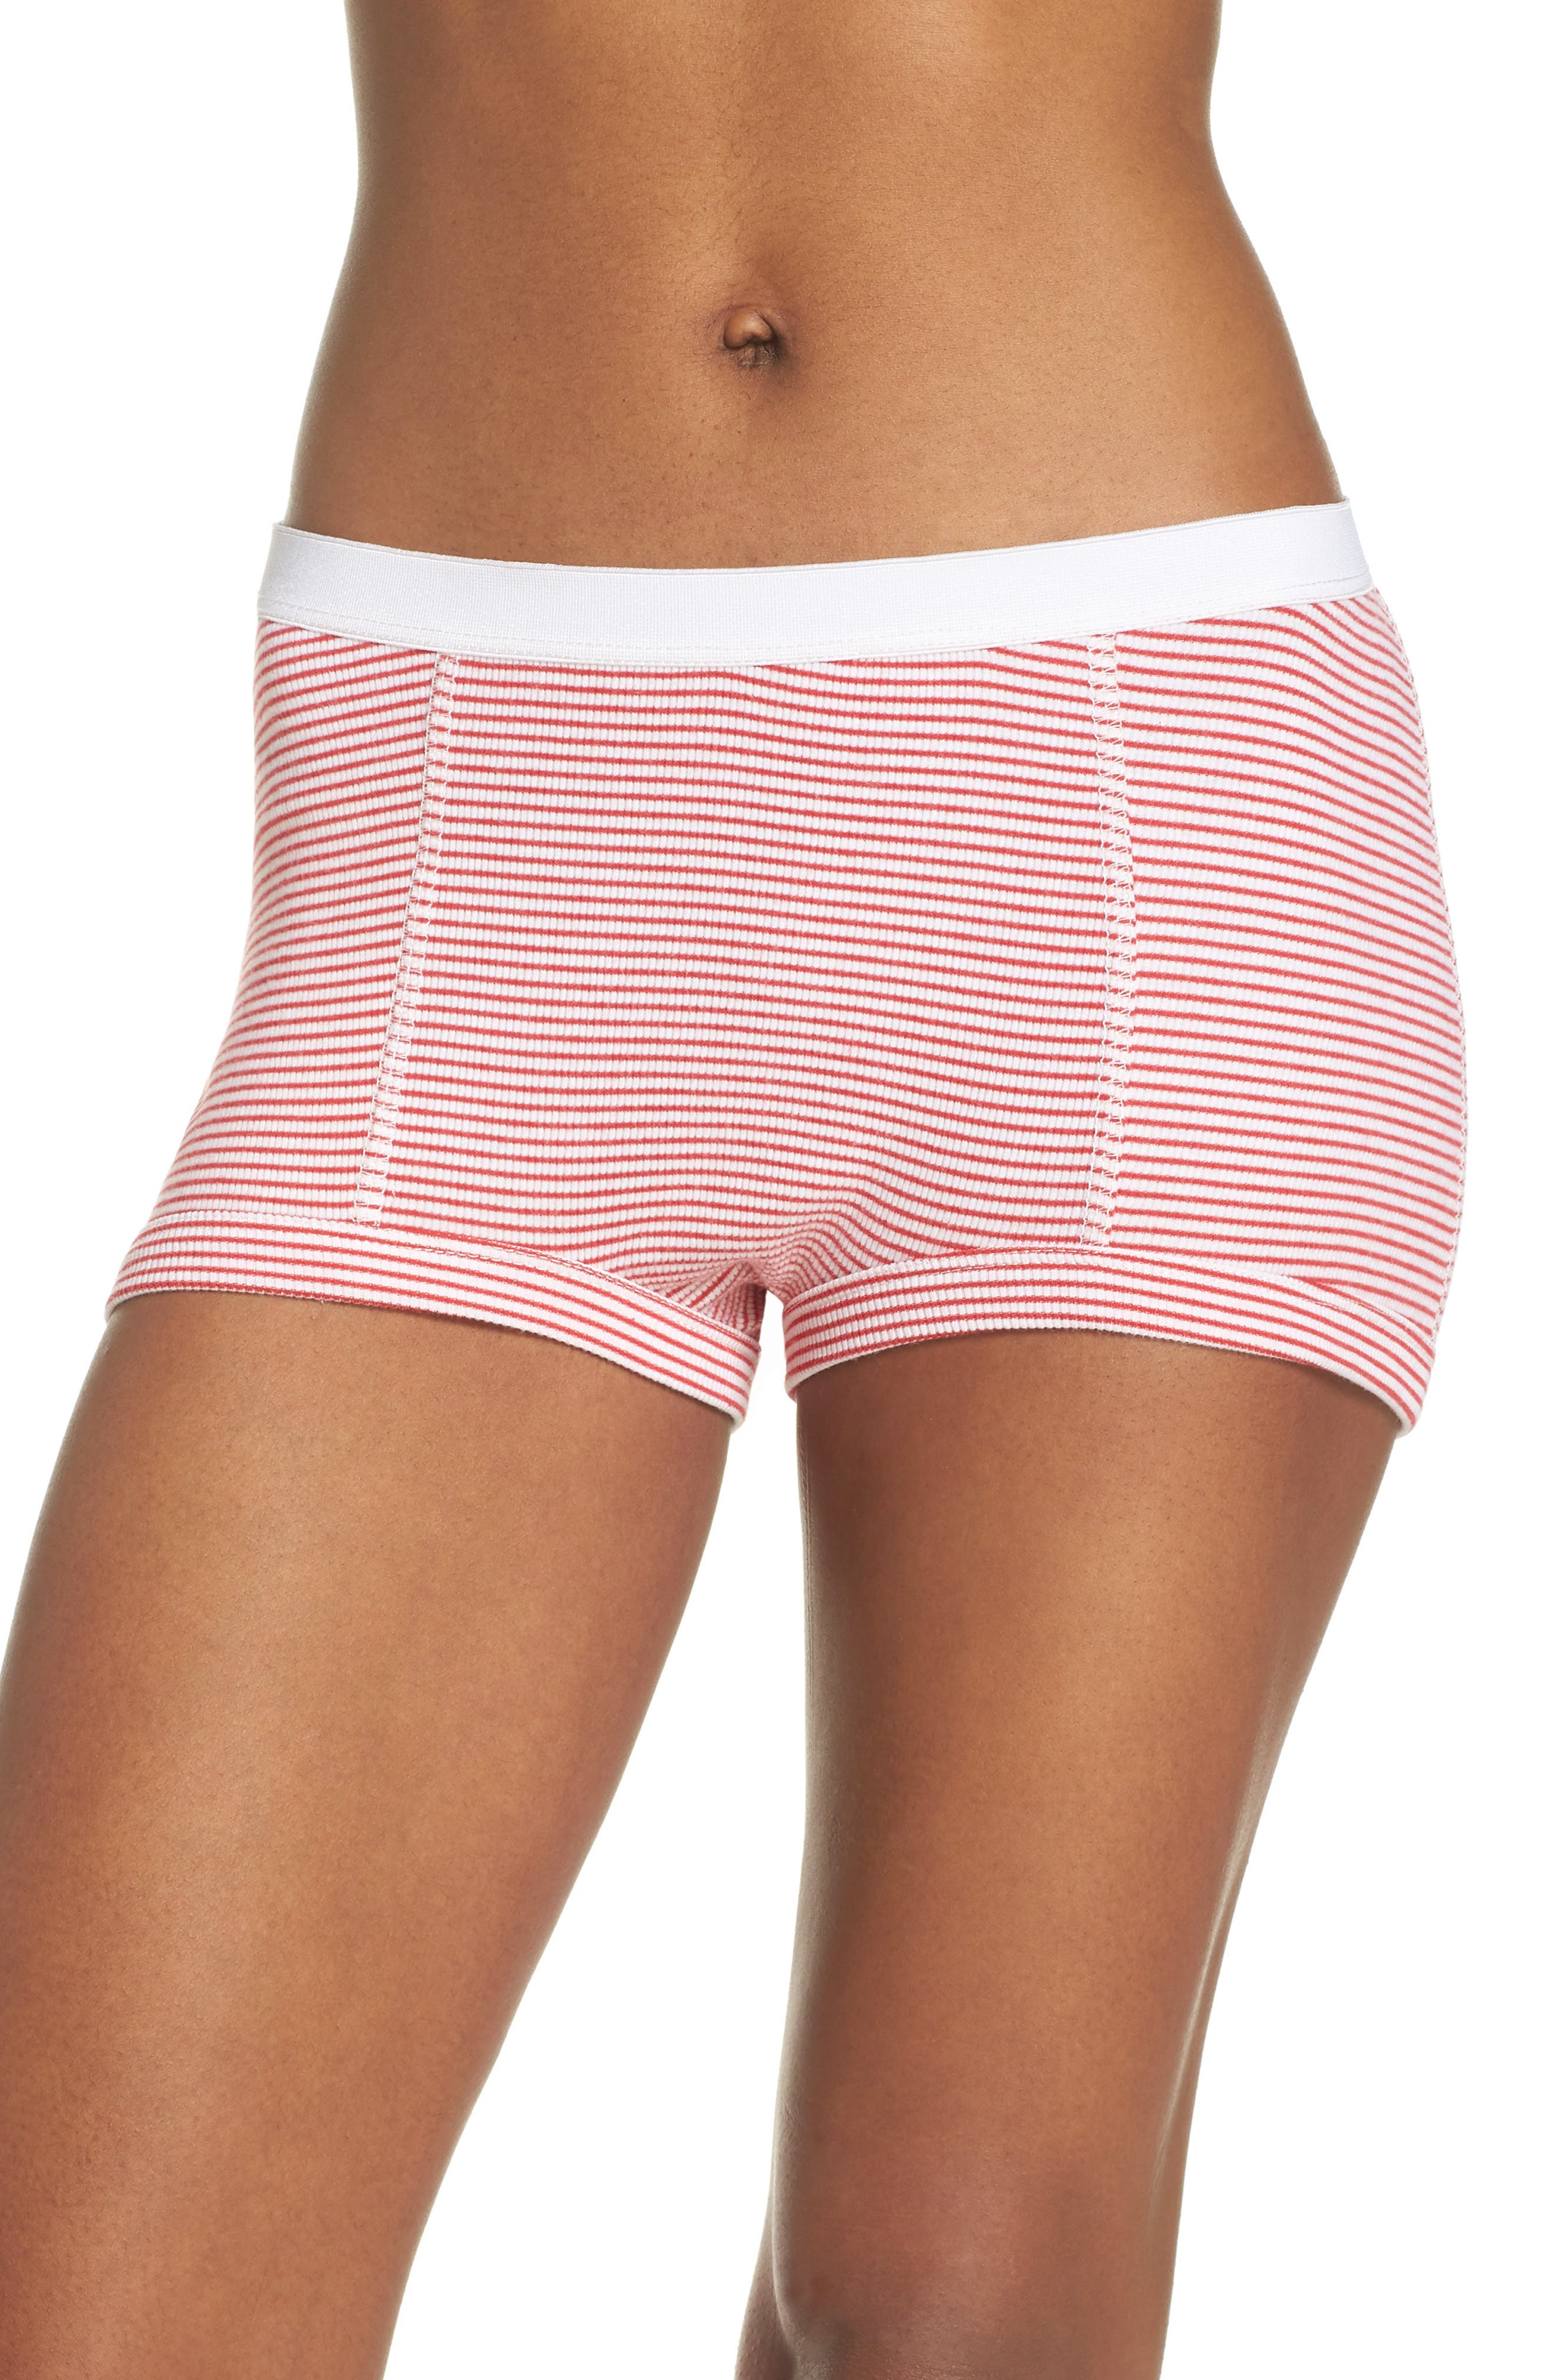 Peony Shorts,                             Main thumbnail 1, color,                             Red Stripe